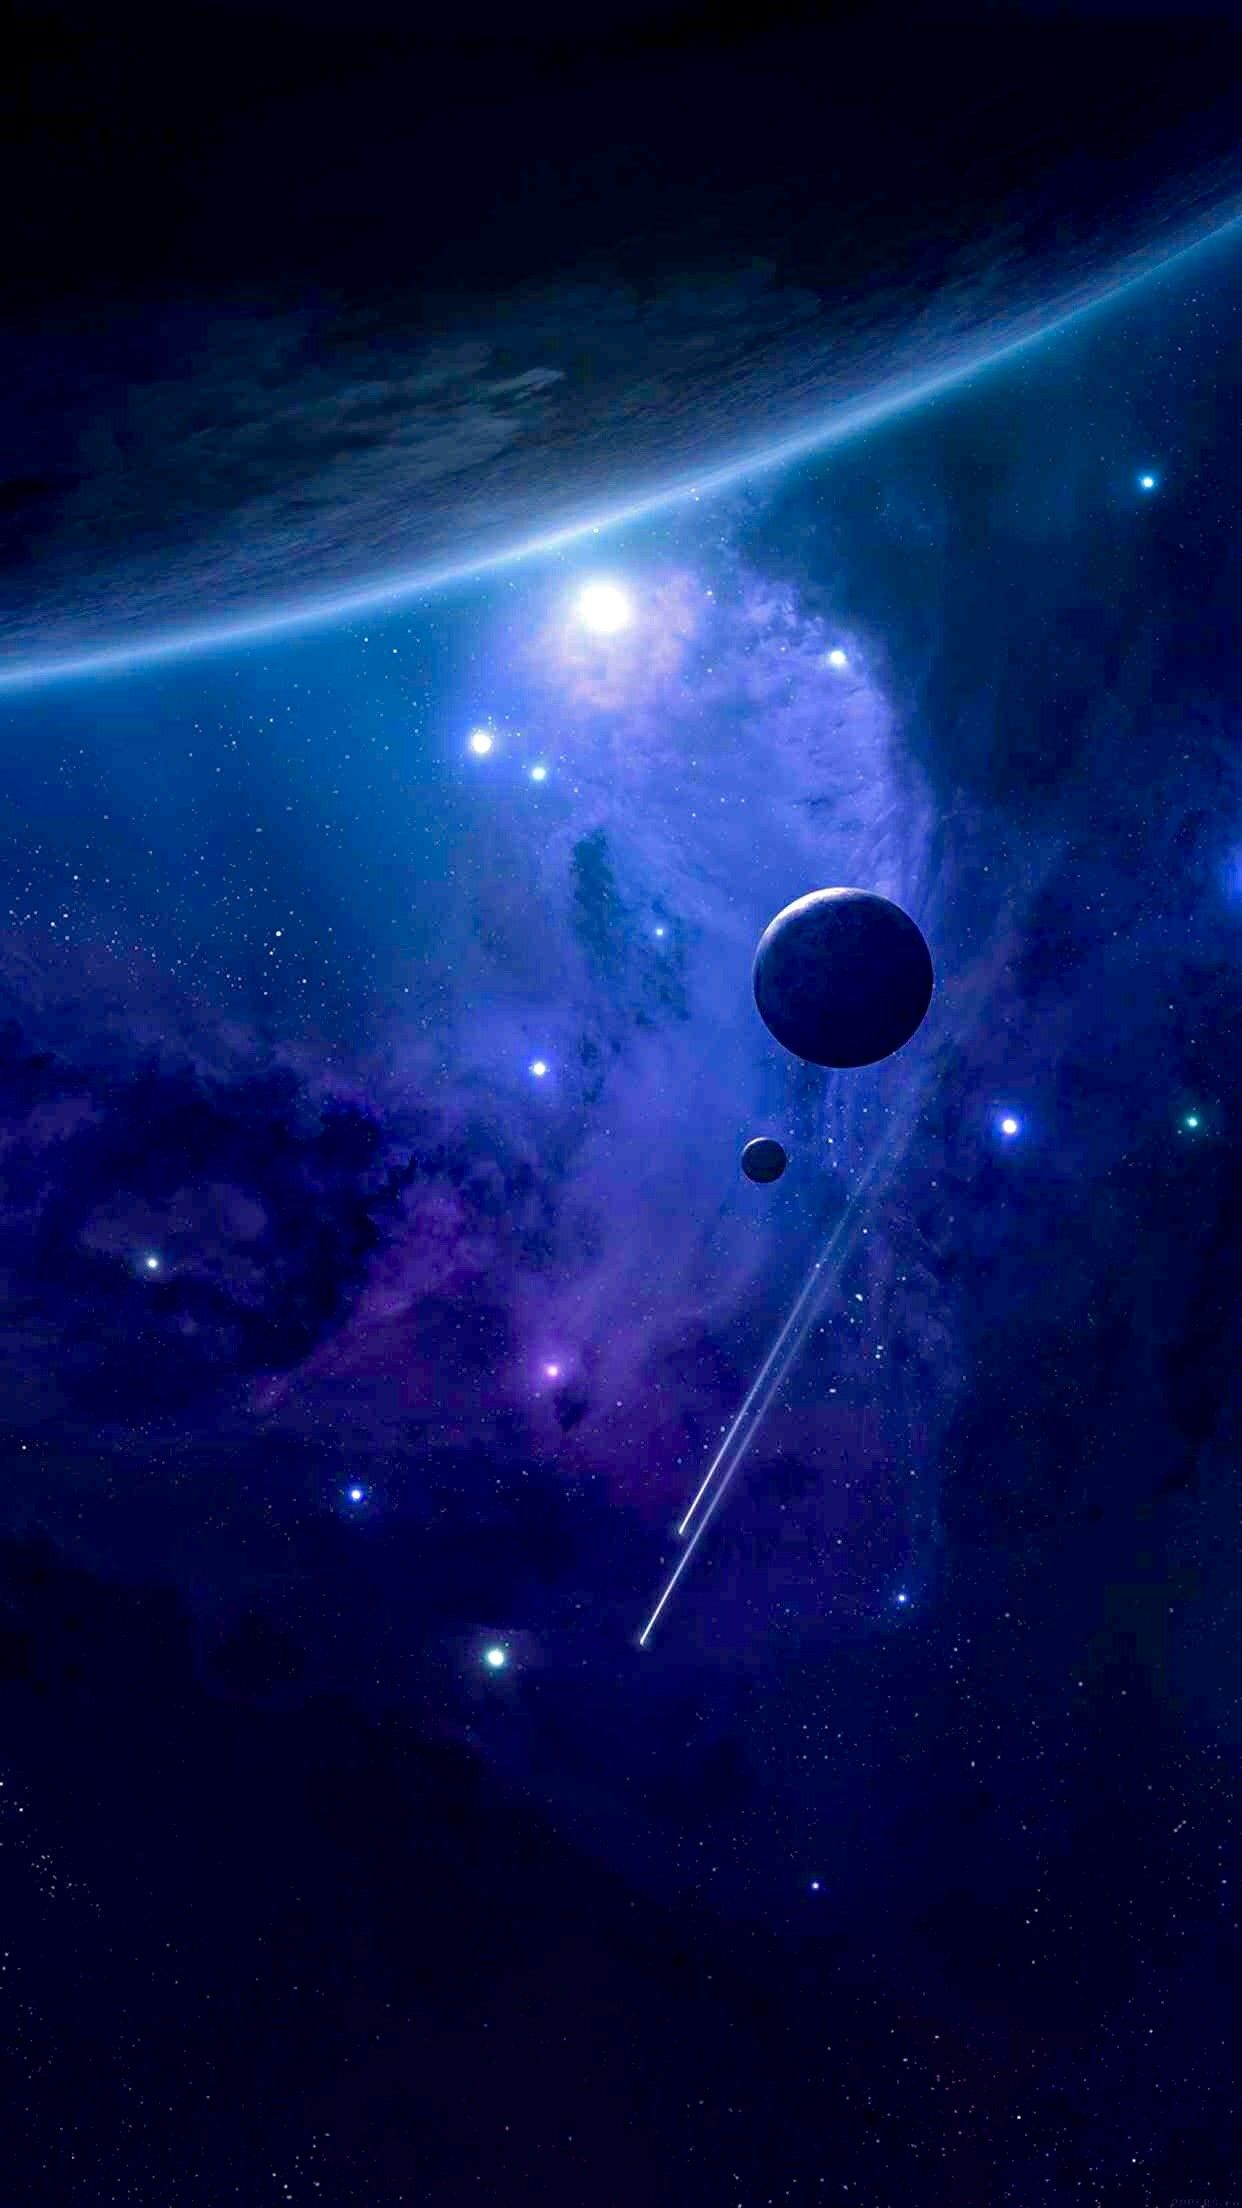 Pin by Rahul Mahato on WALLPAPERS Space fantasy, Dark